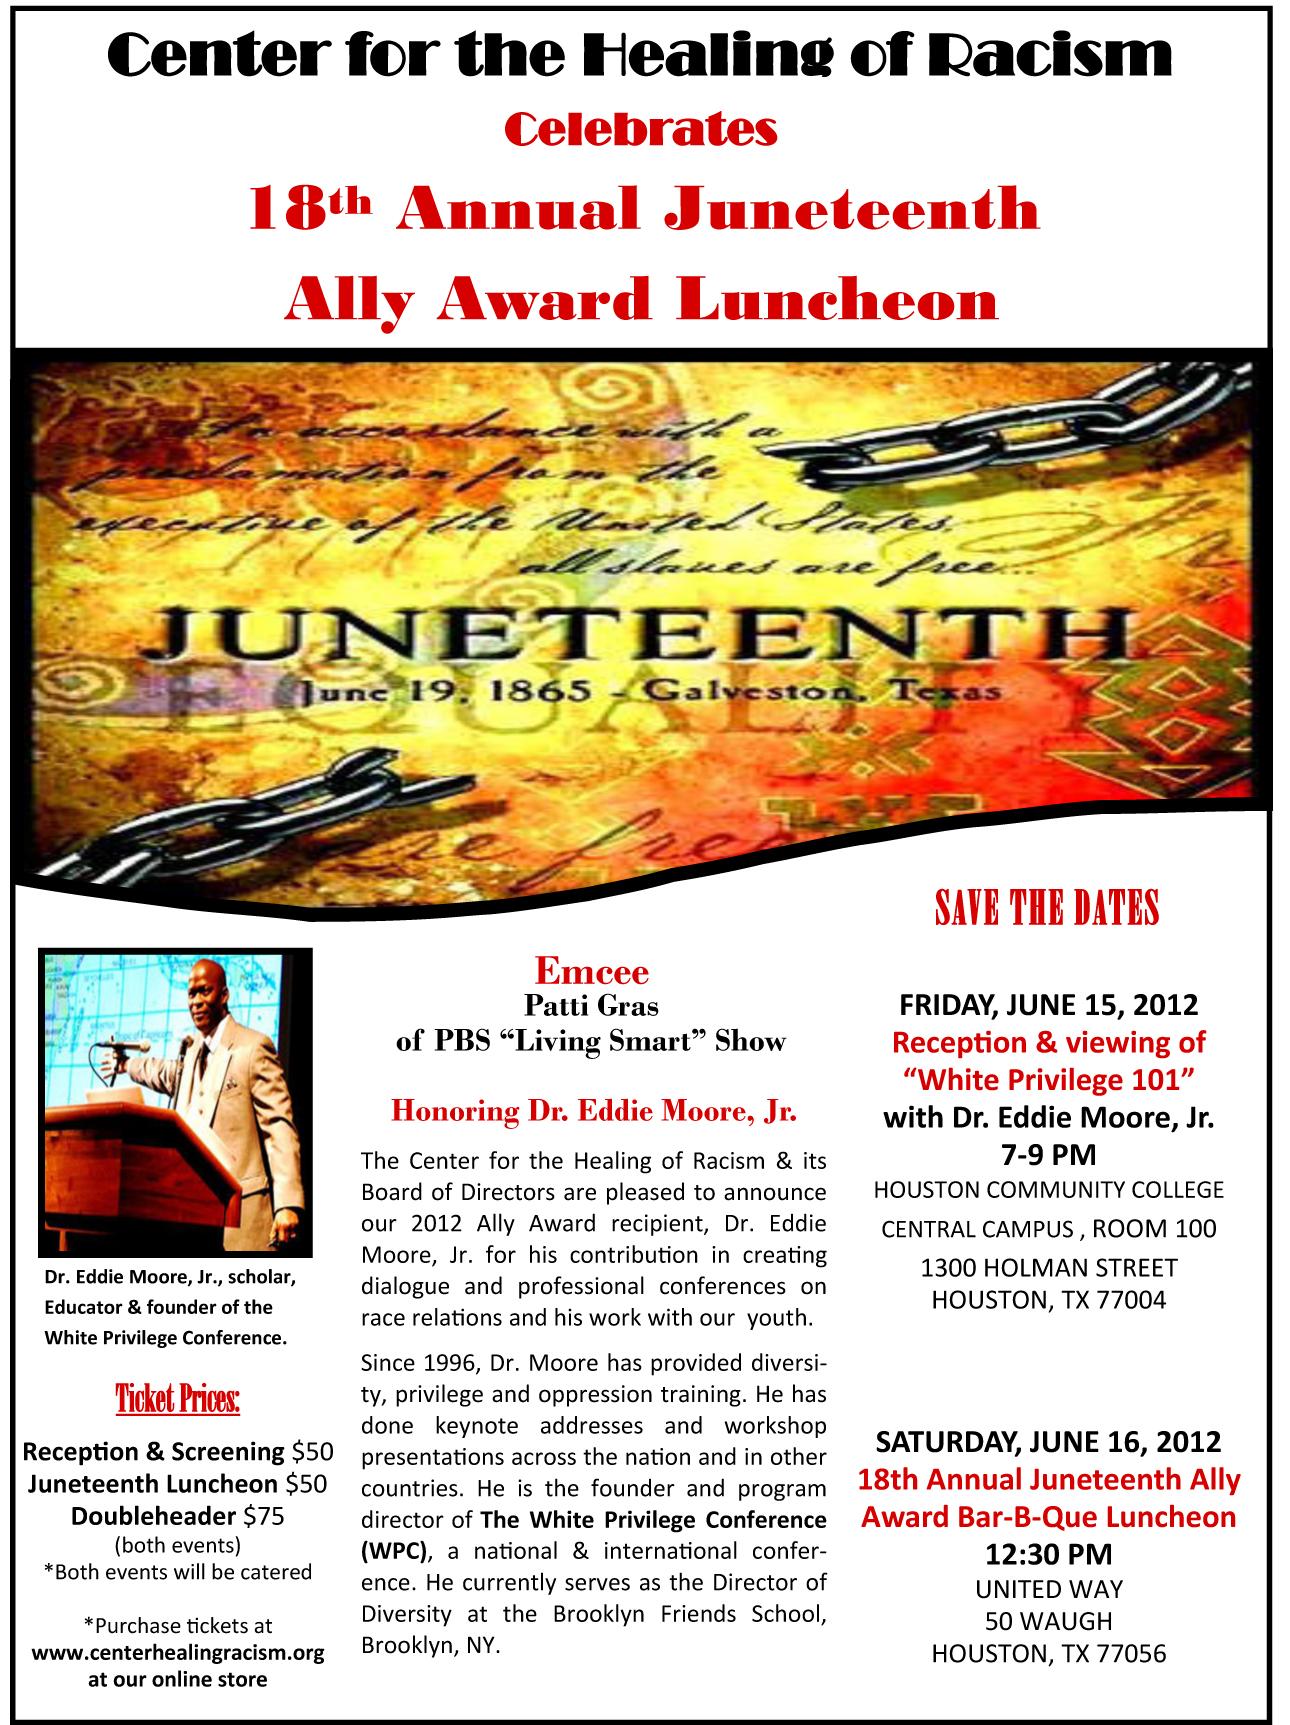 18th Annual Juneteenth Flier